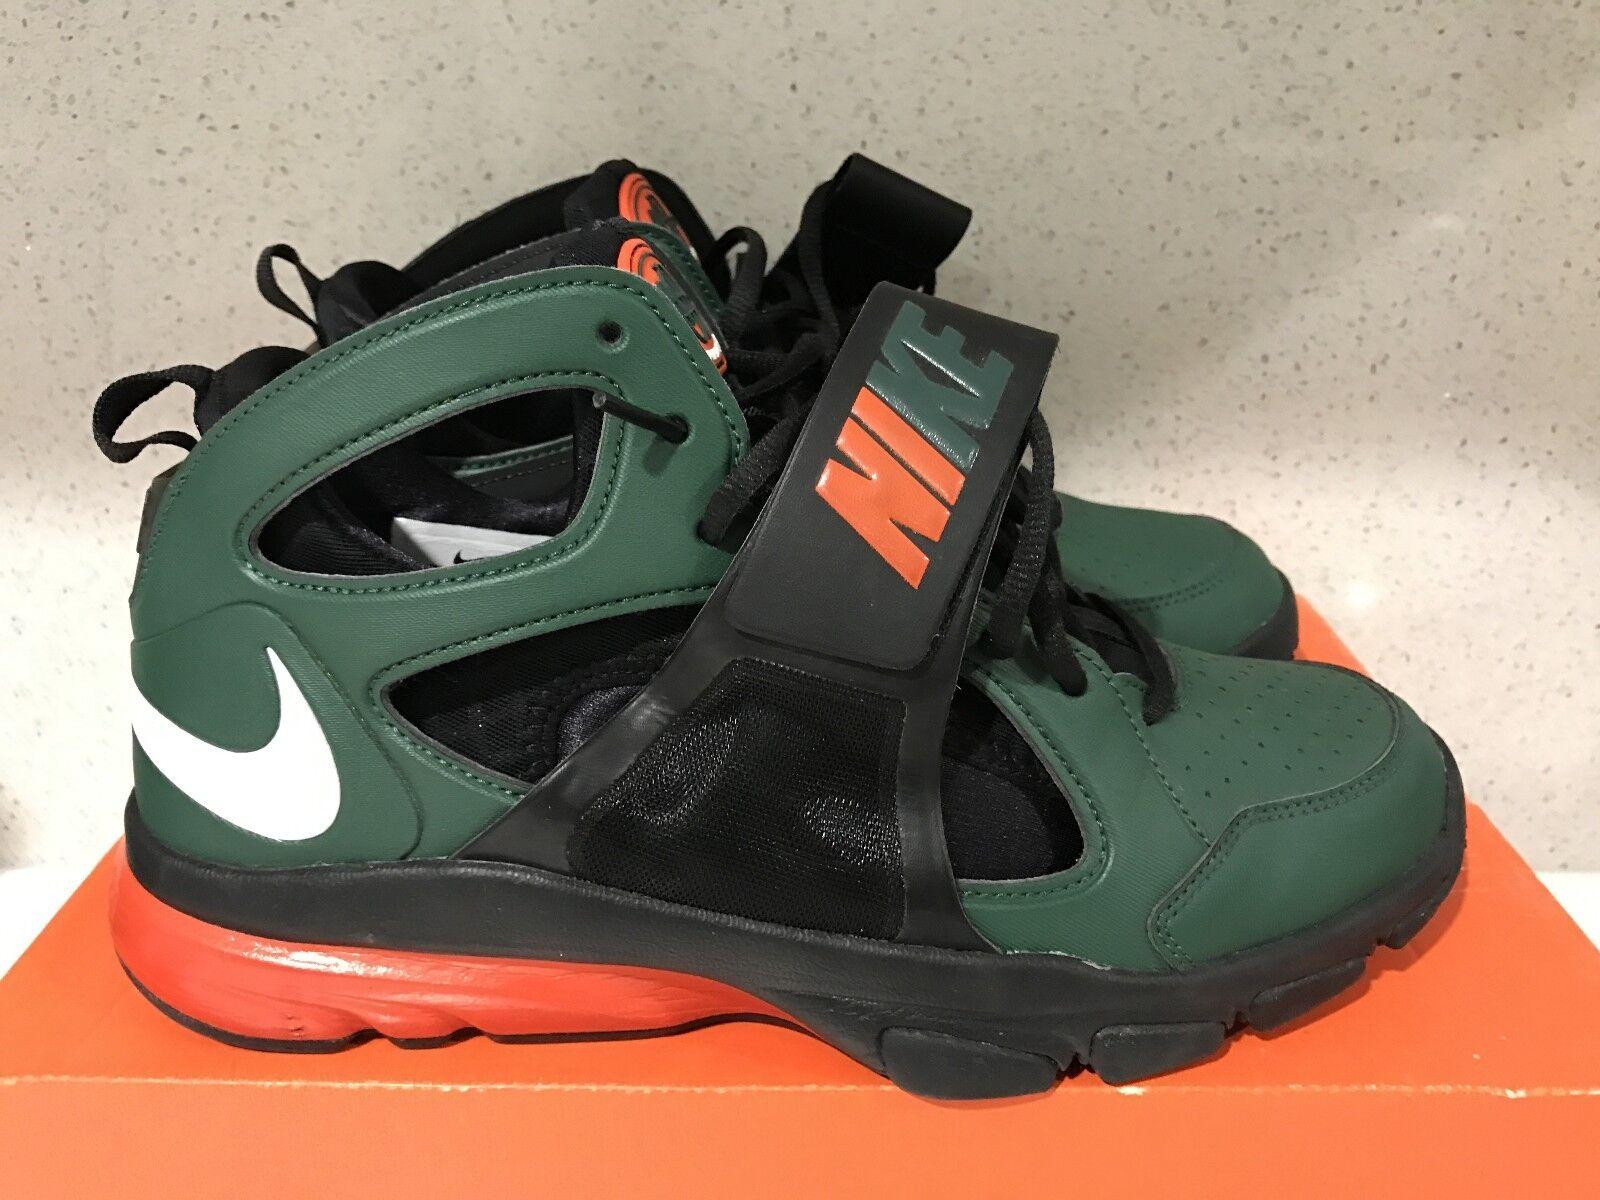 Nike Zoom Huarache TR Mid SZ 9 University Of Miami UM Canes 414975-318